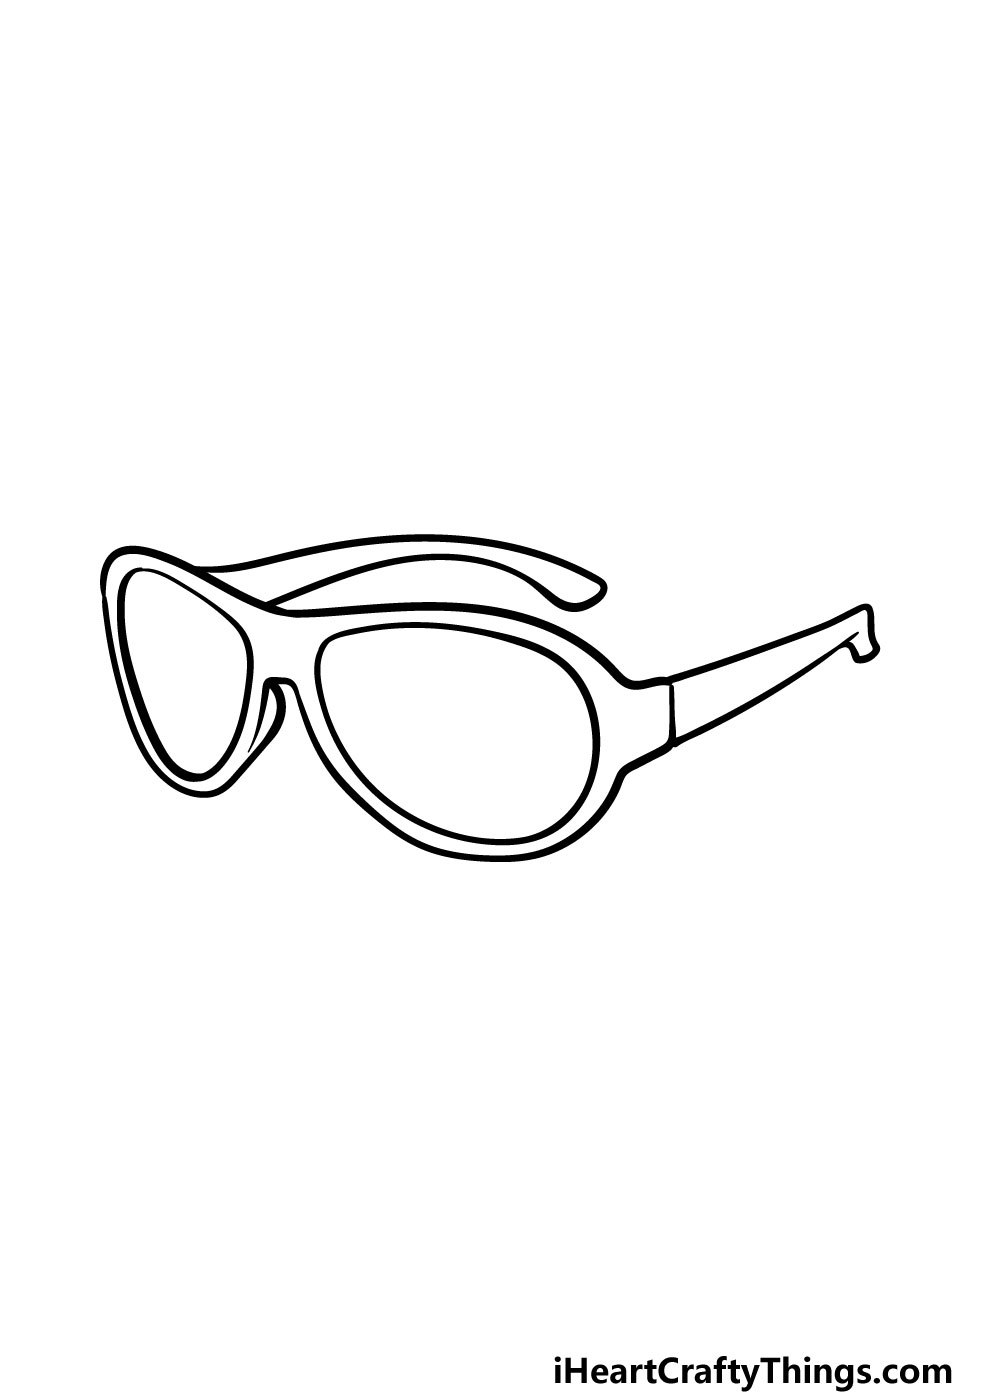 drawing sunglasses step 5